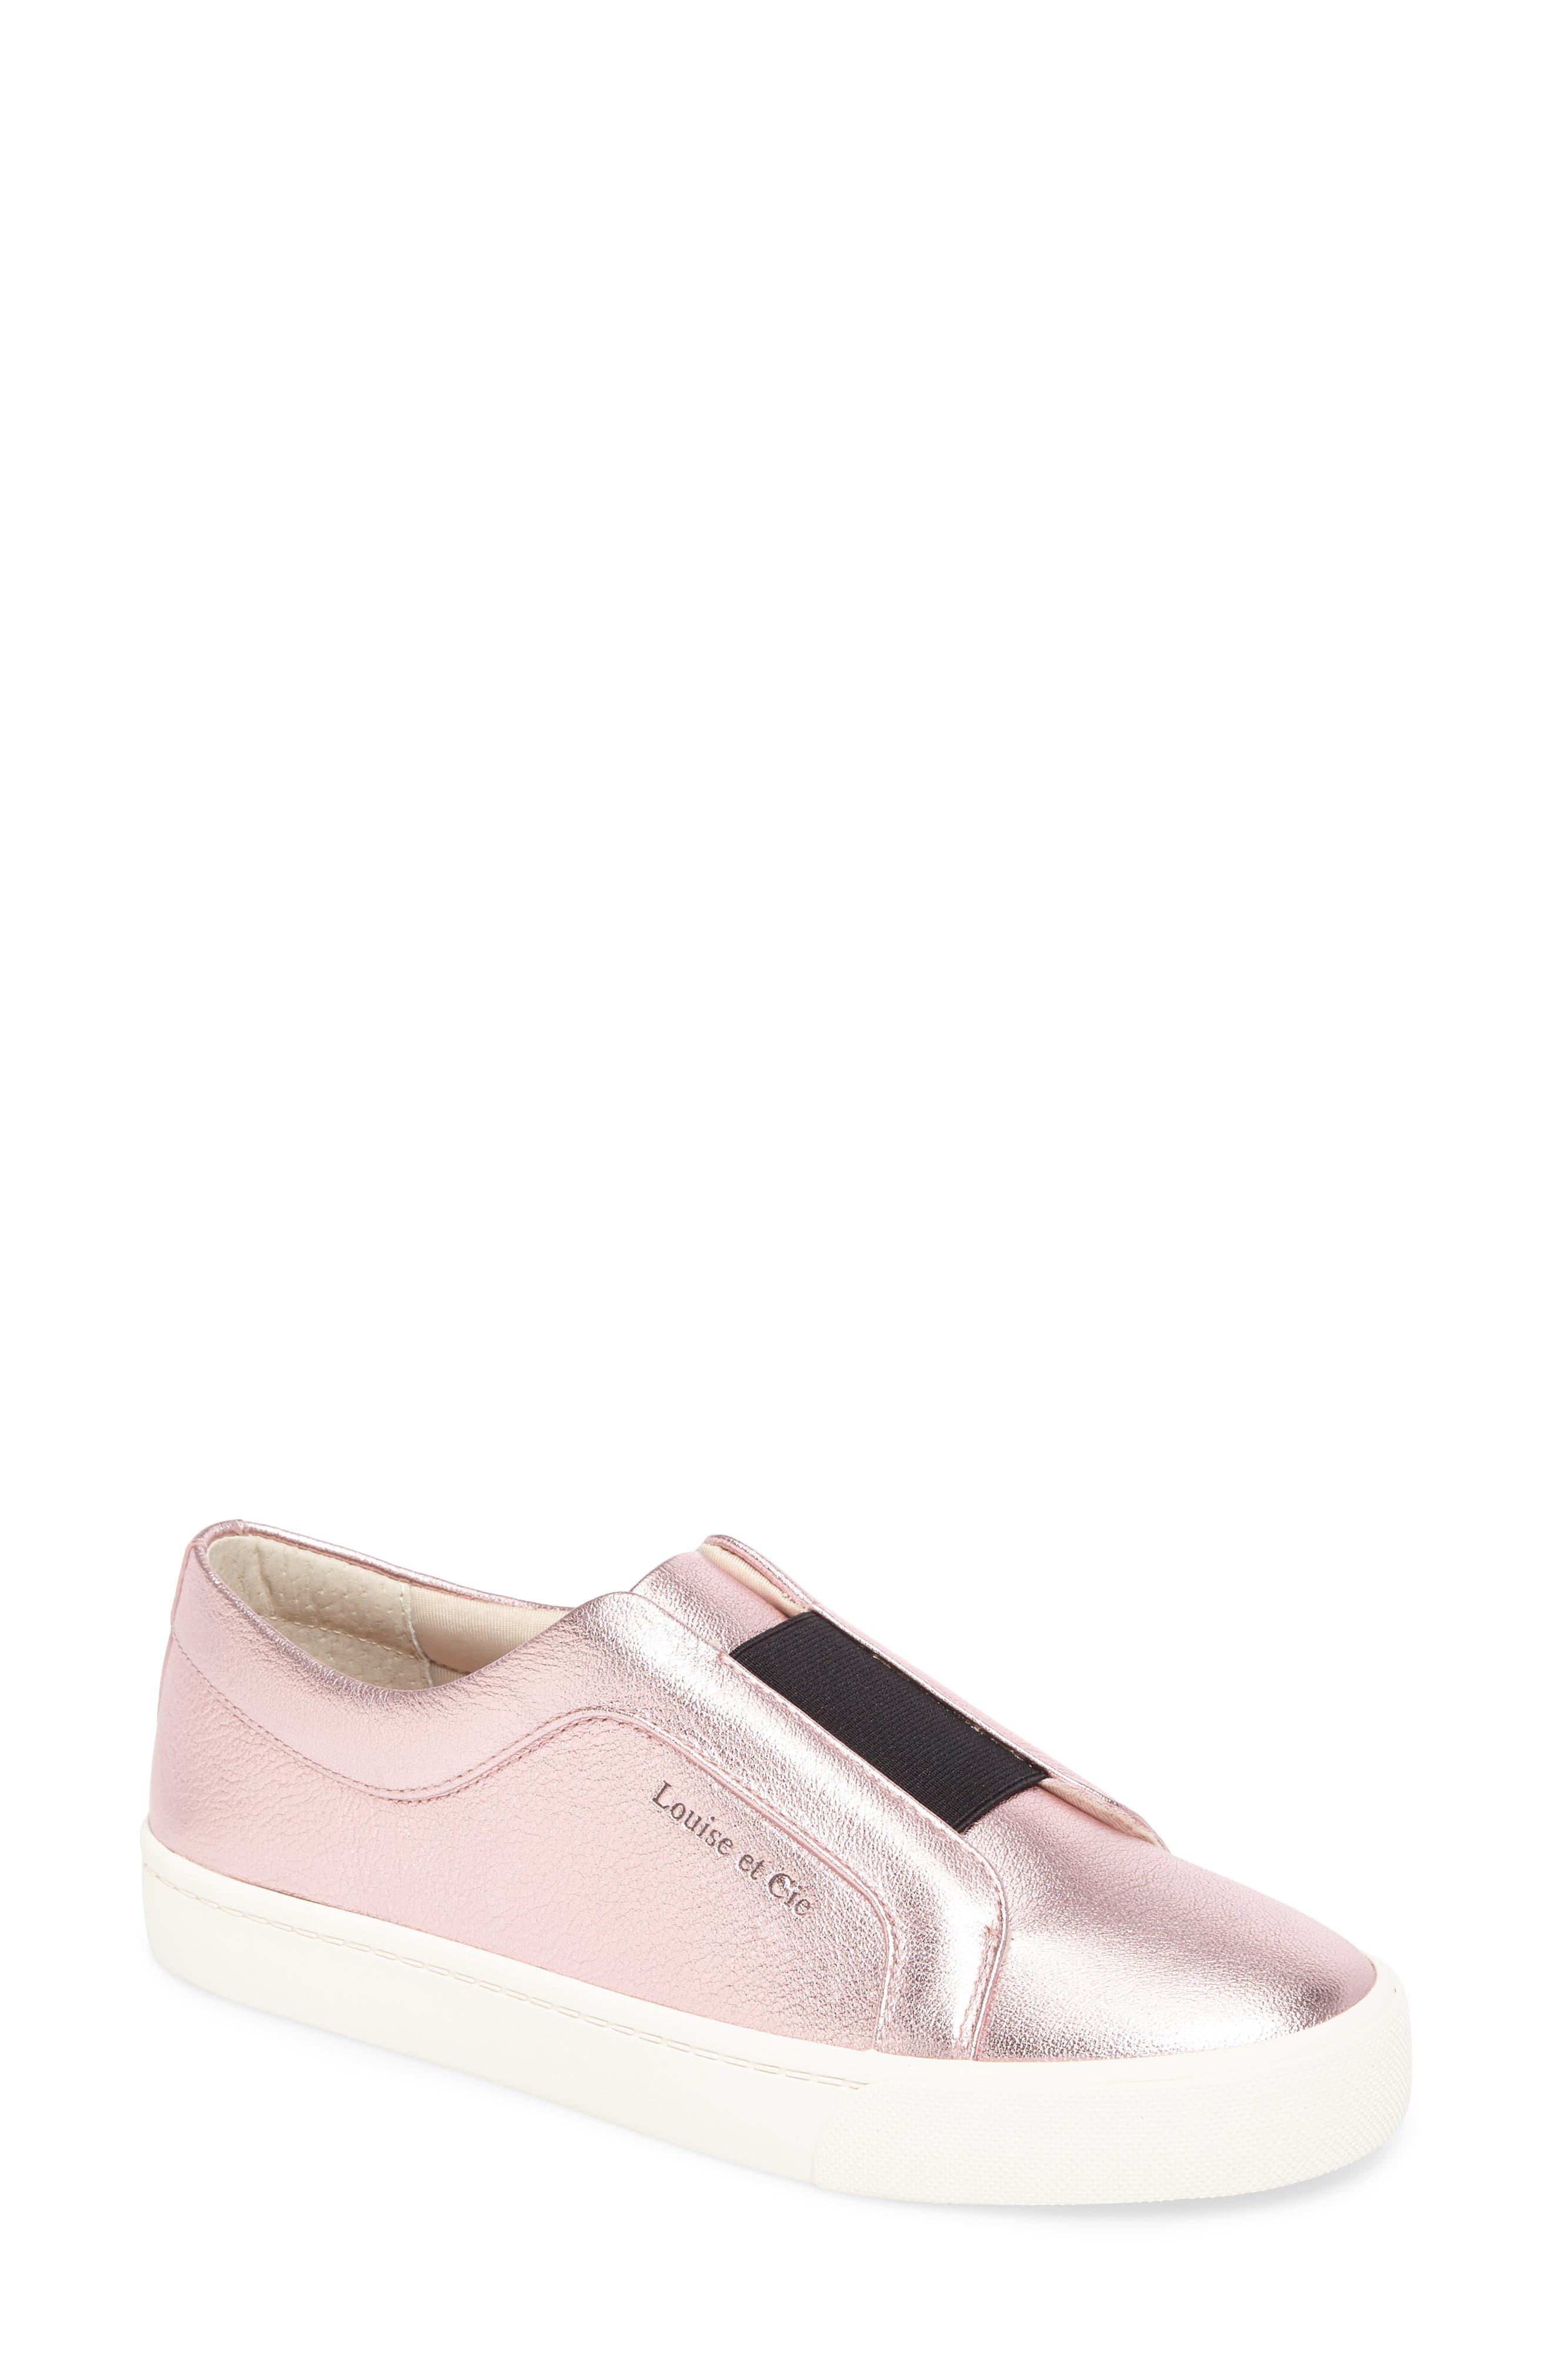 Main Image - Louise et Cie Bette Slip-On Sneaker (Women)